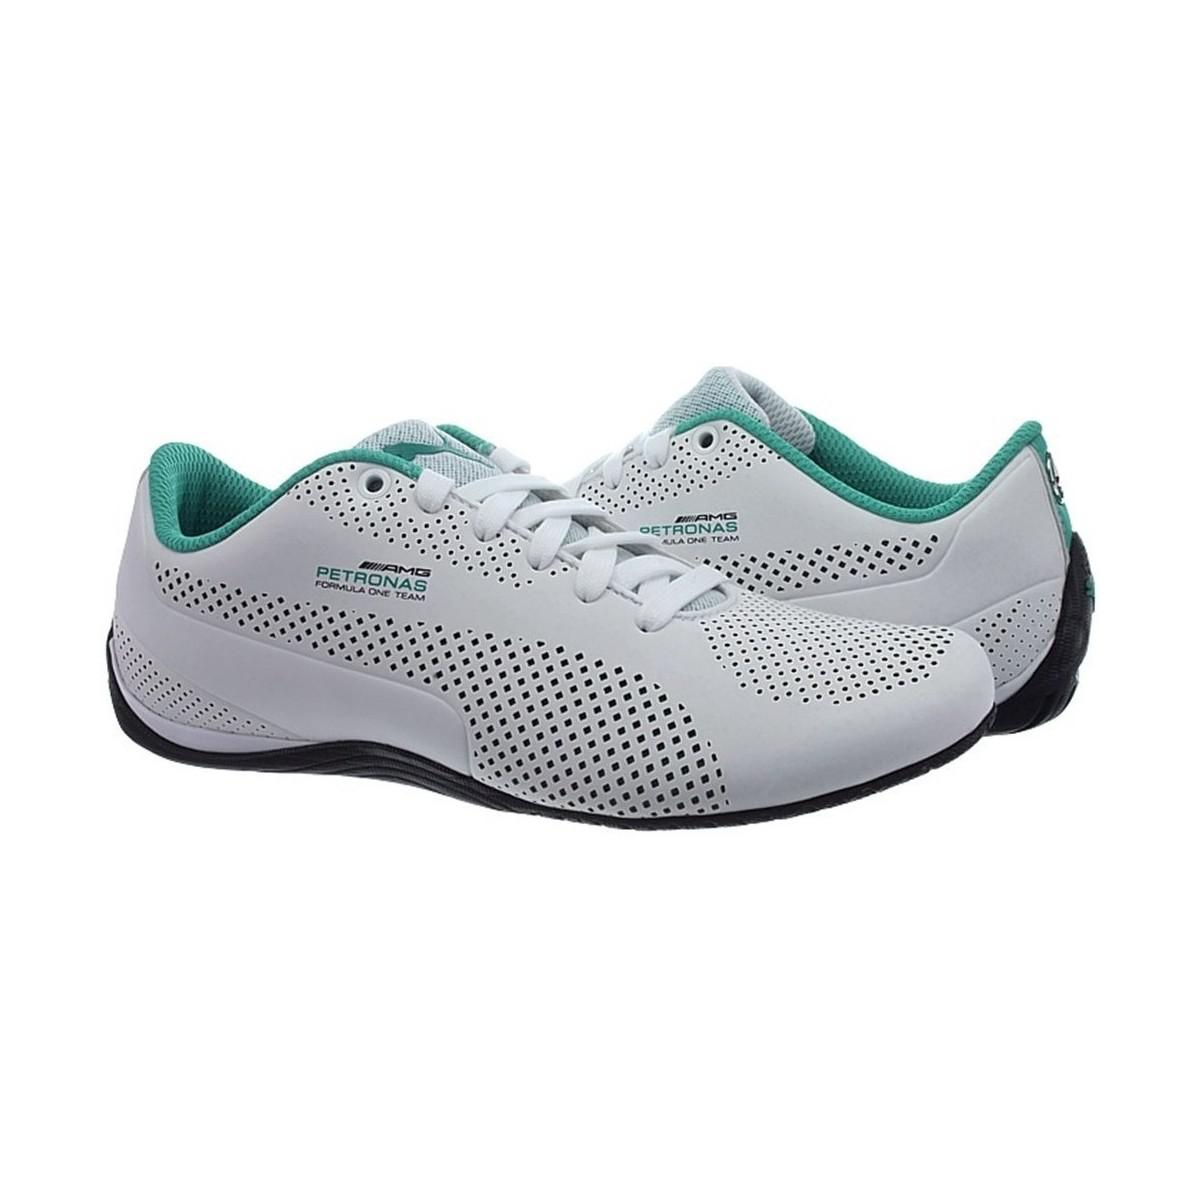 7d8a743328d PUMA Mamgp Drift Cat Ultra Sneaker in White for Men - Lyst